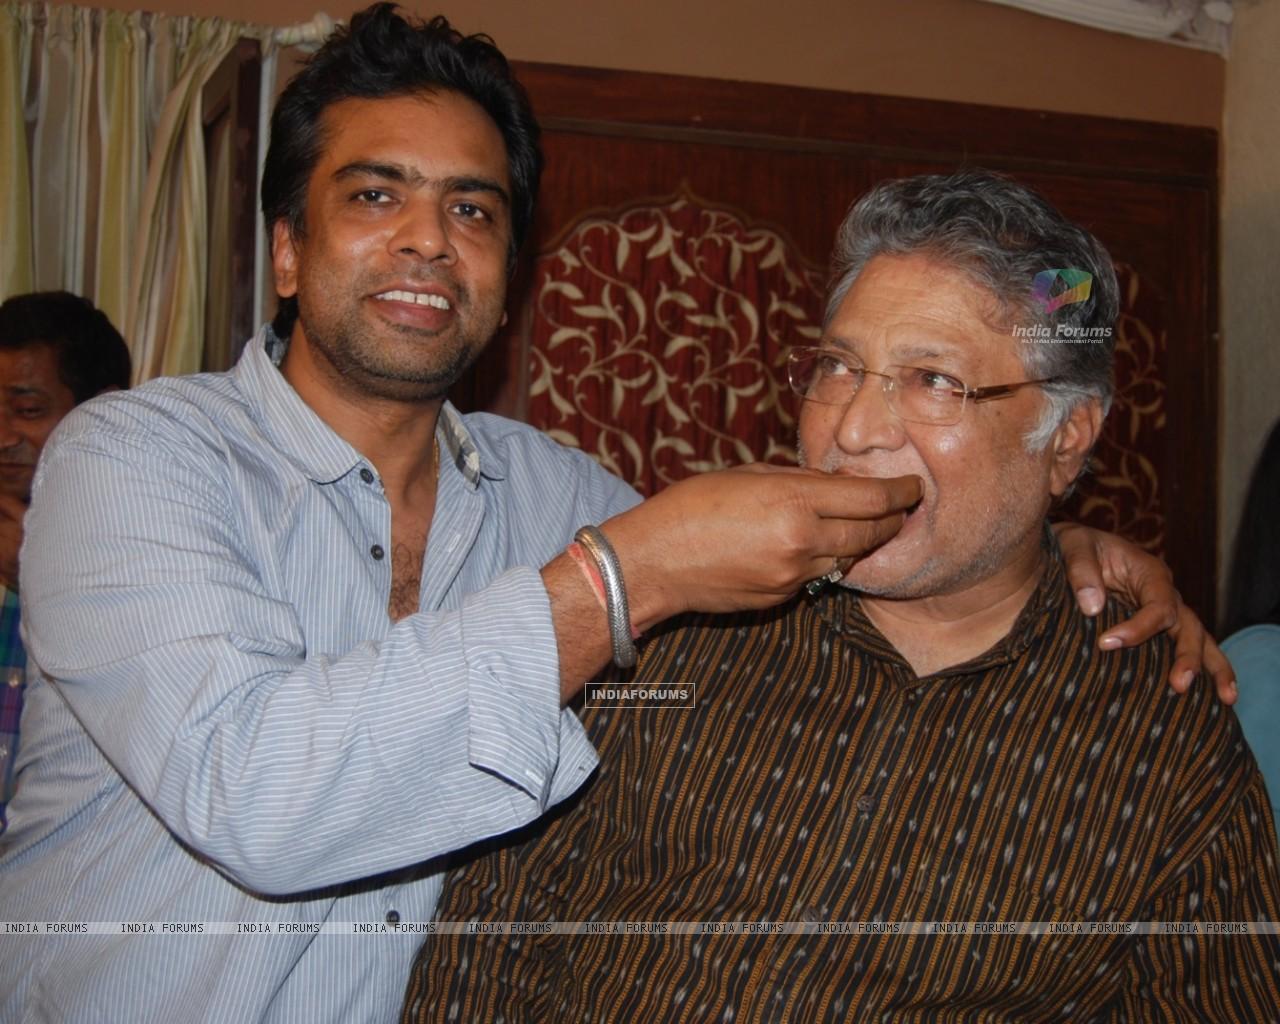 Wallpaper   Gajendra Singh celebrates Vikram Gokhales National 1280x1024